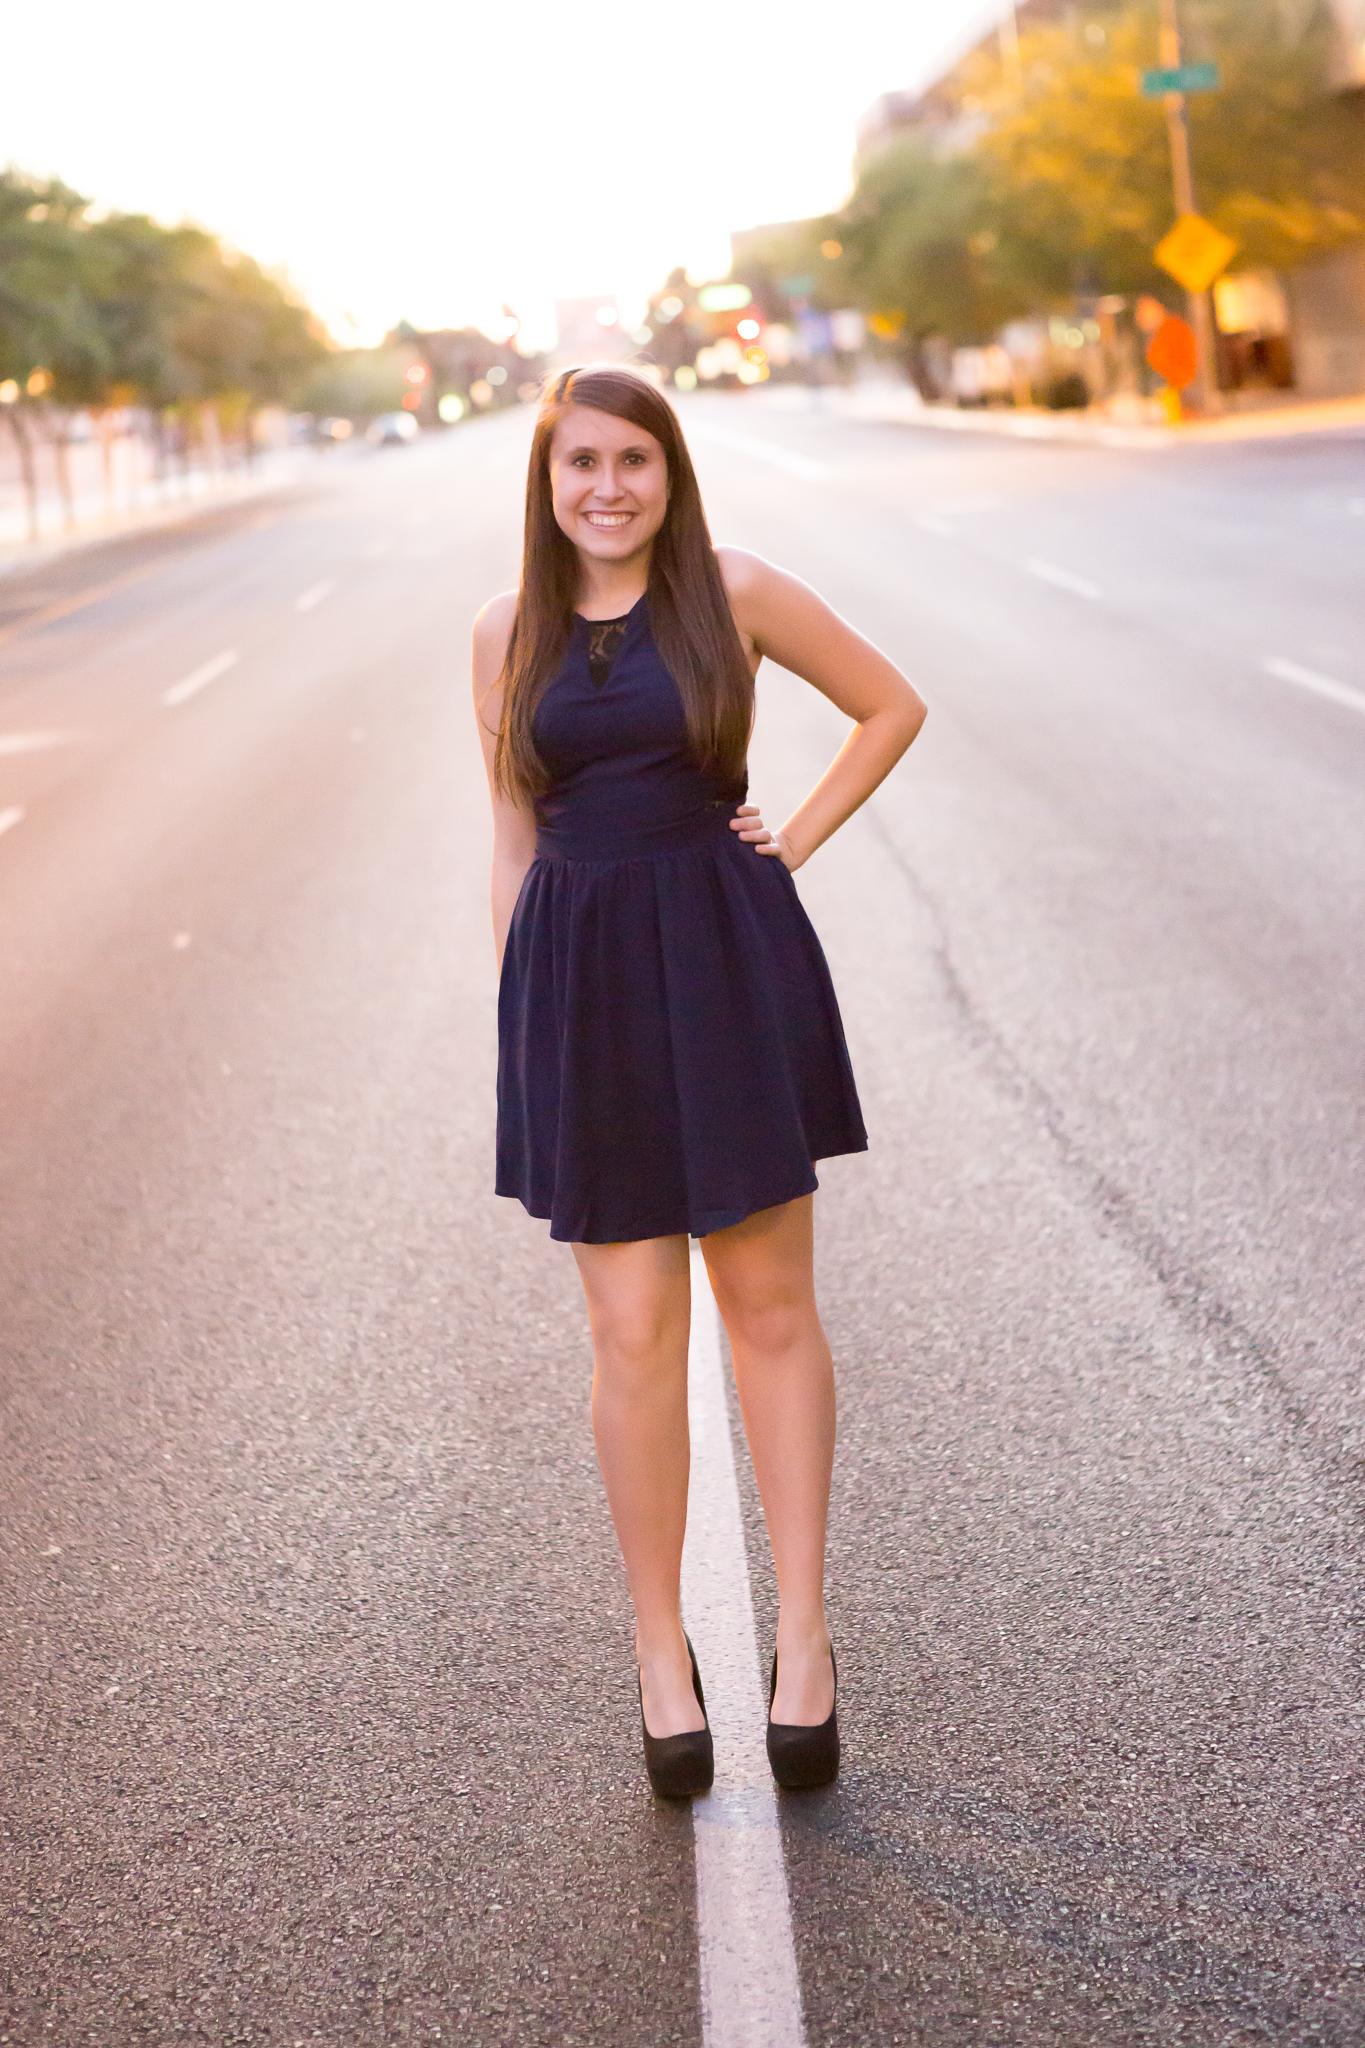 senior-photography-downtown-phoenix-street-dress